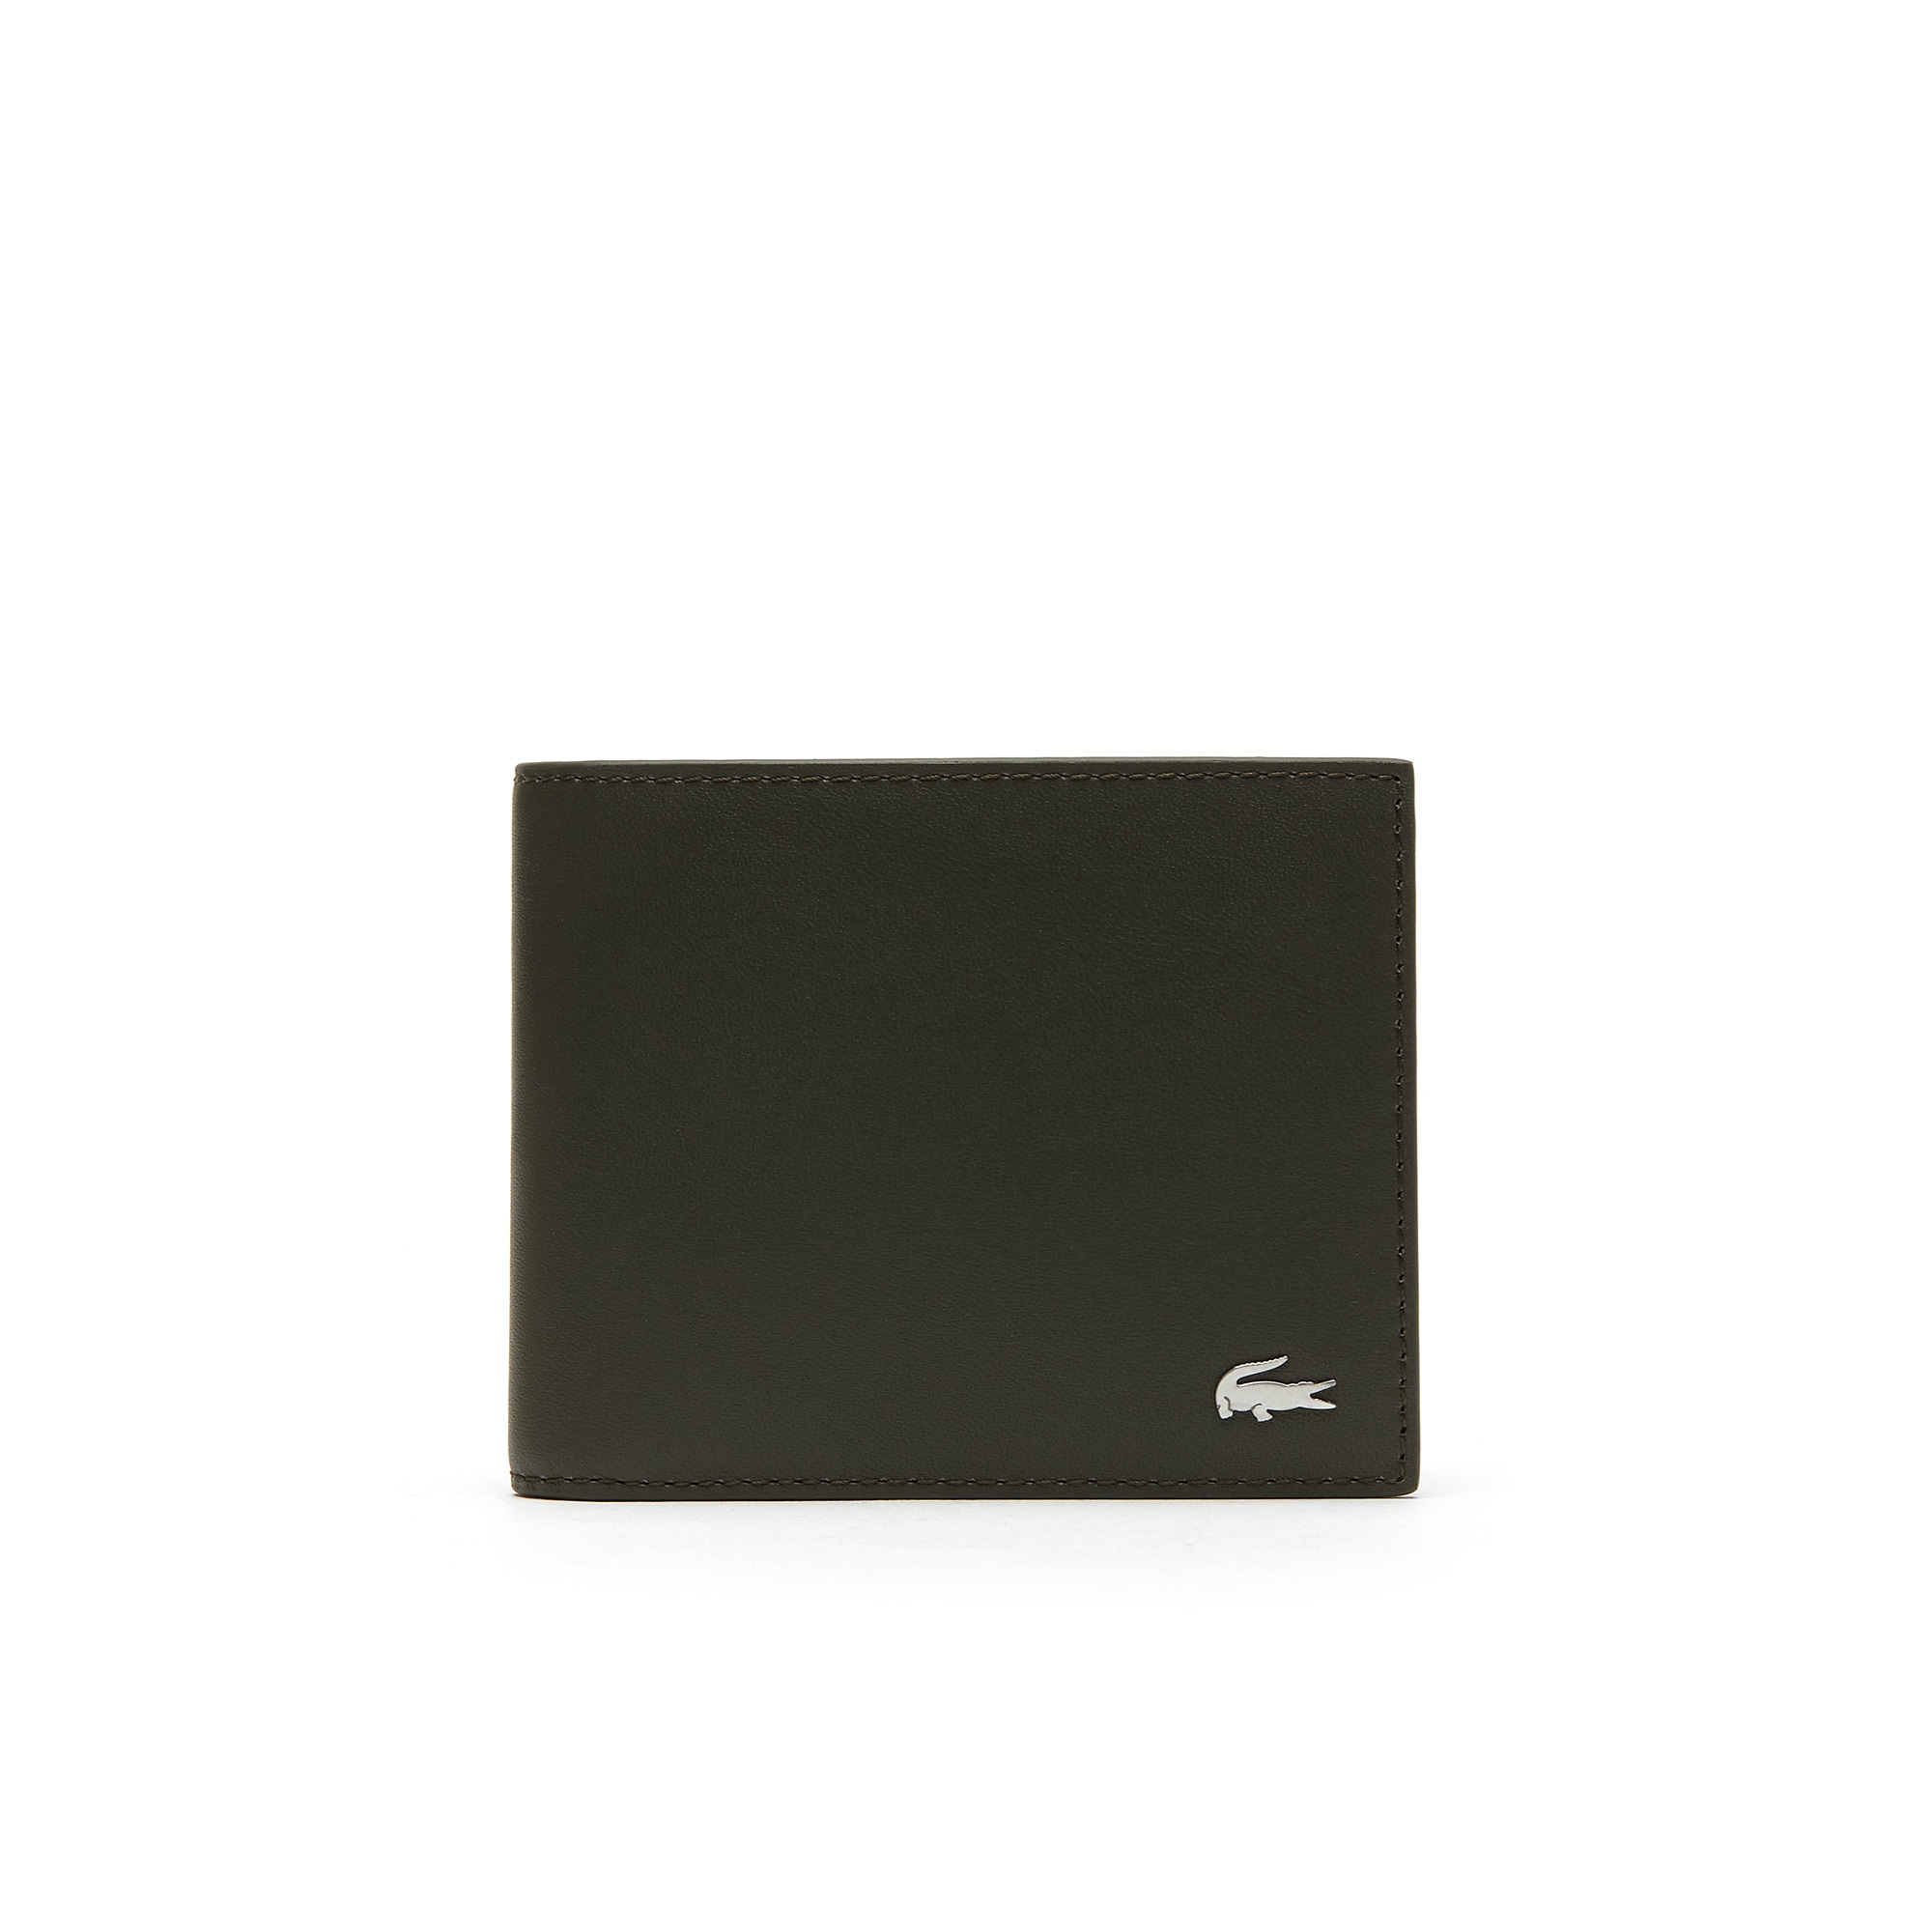 Men's FG Leather Six Card Wallet